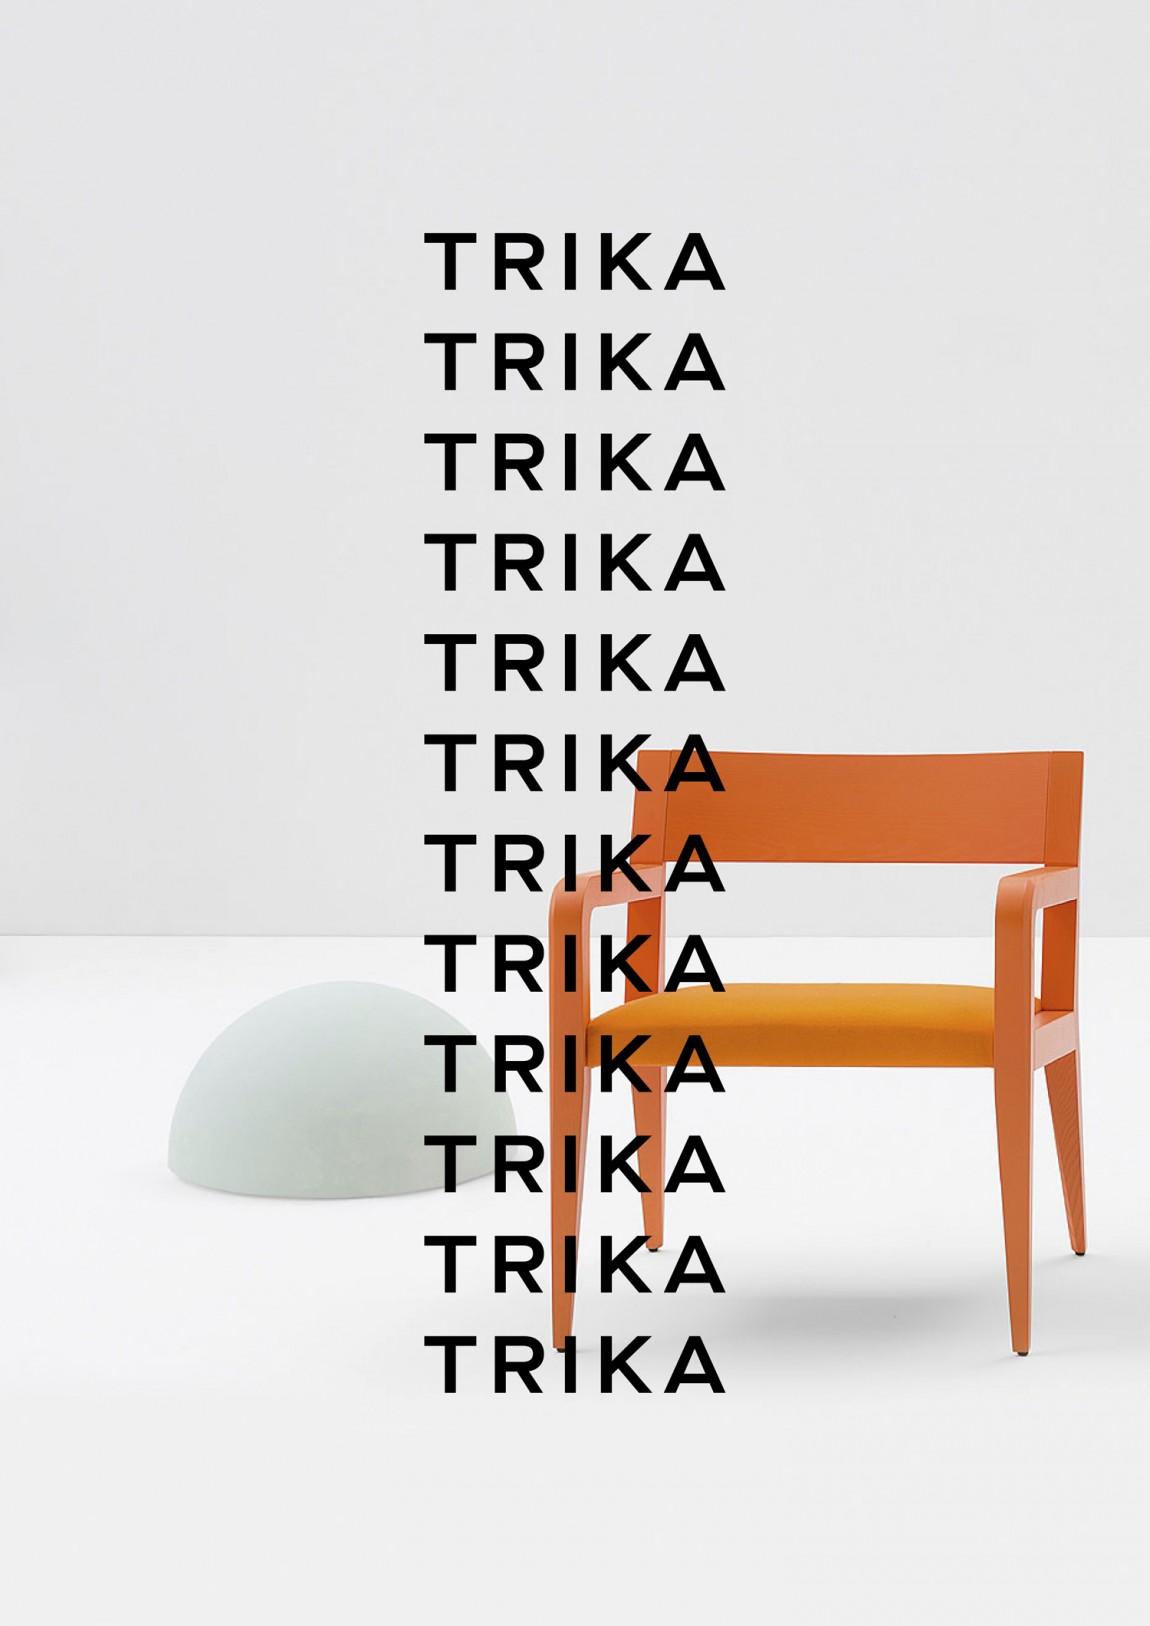 Trika室内设计公司品牌logo设计